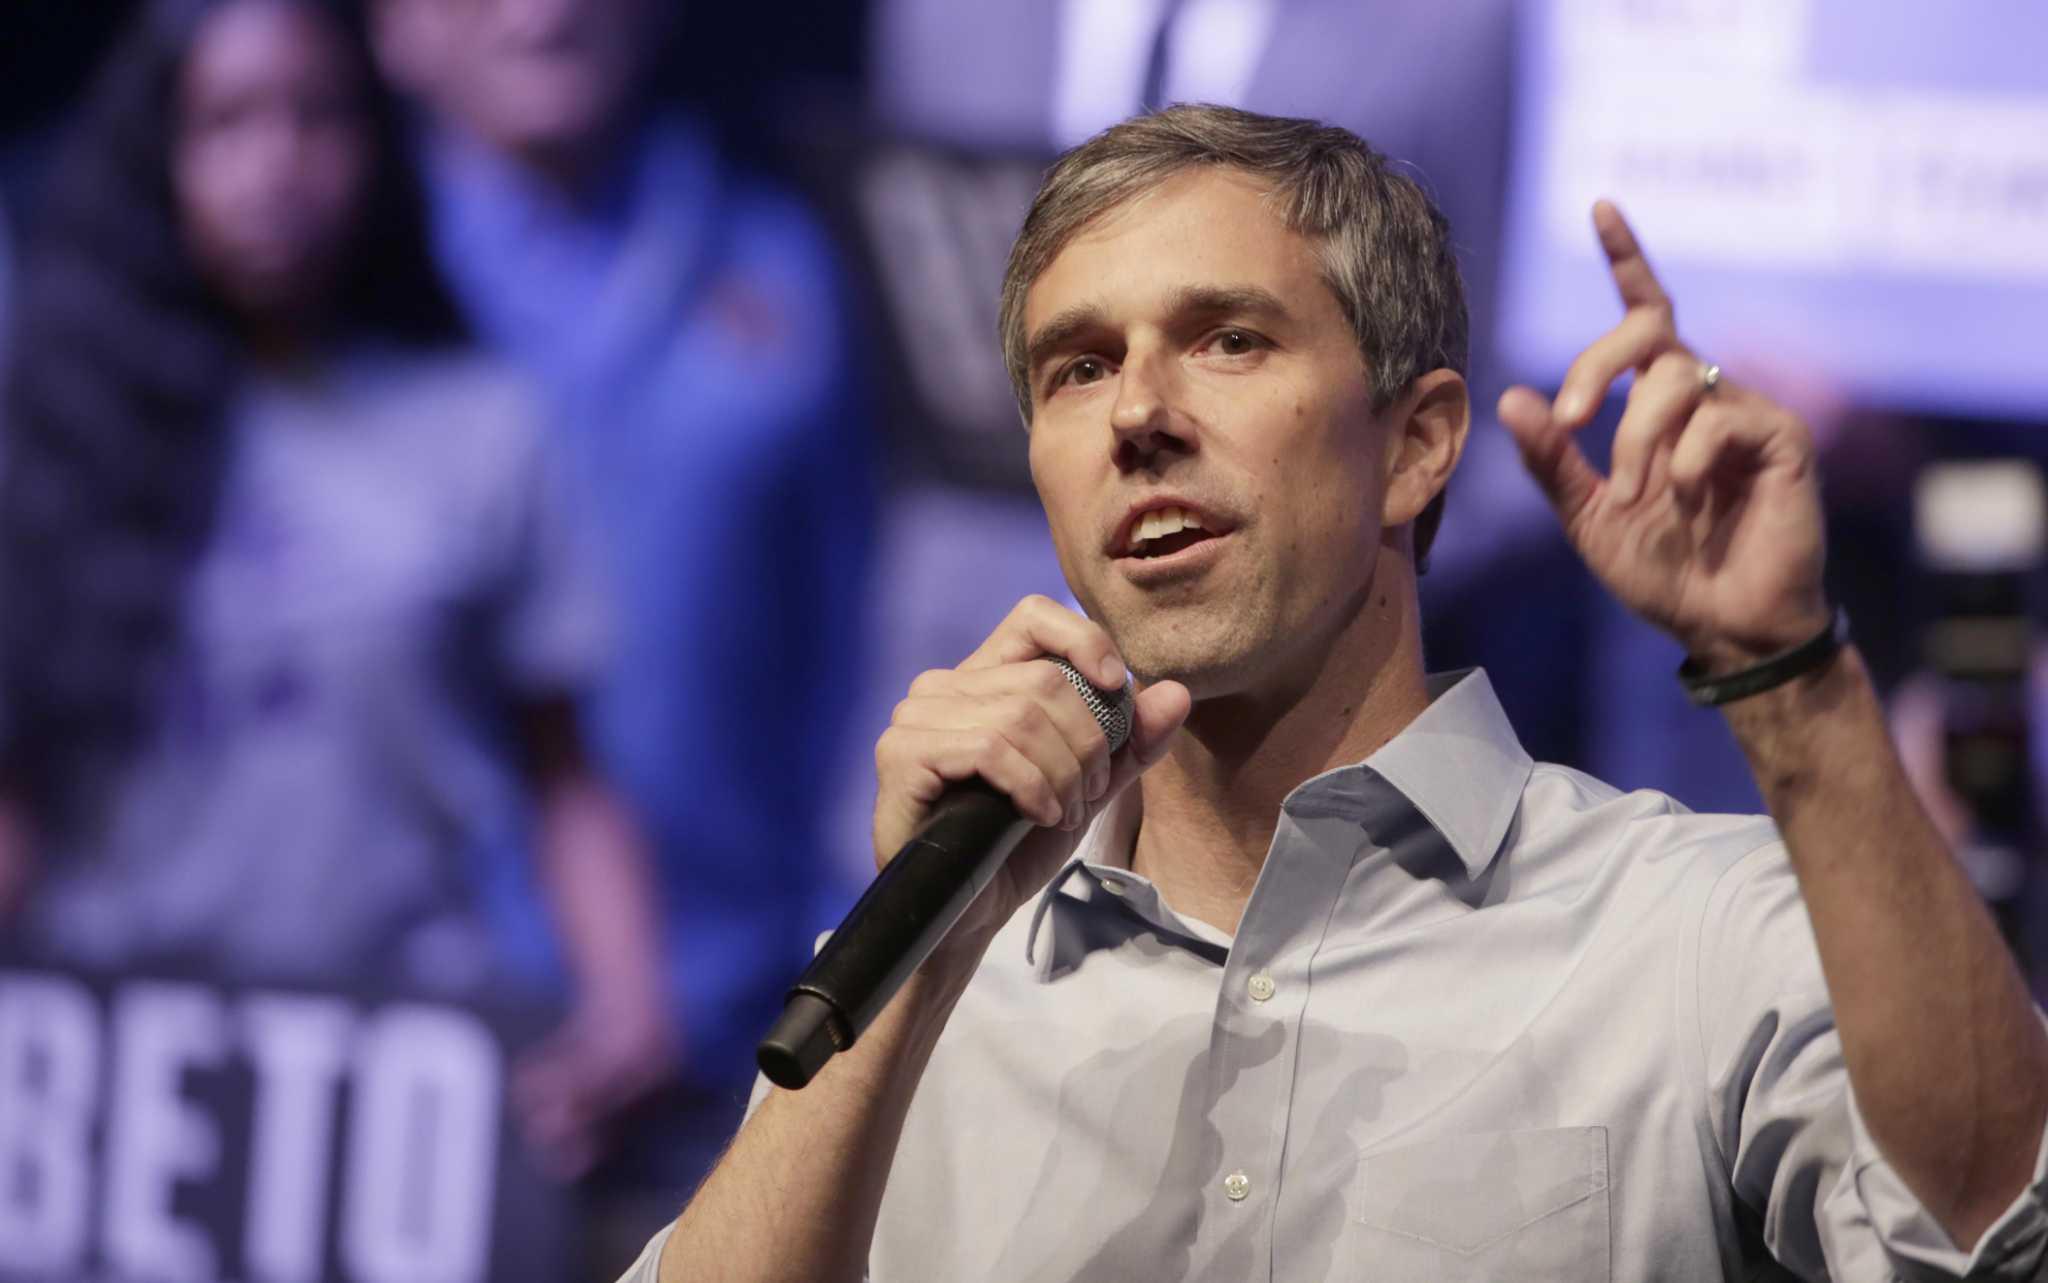 Beto O'Rourke says Texas is 'Joe Biden's to lose'